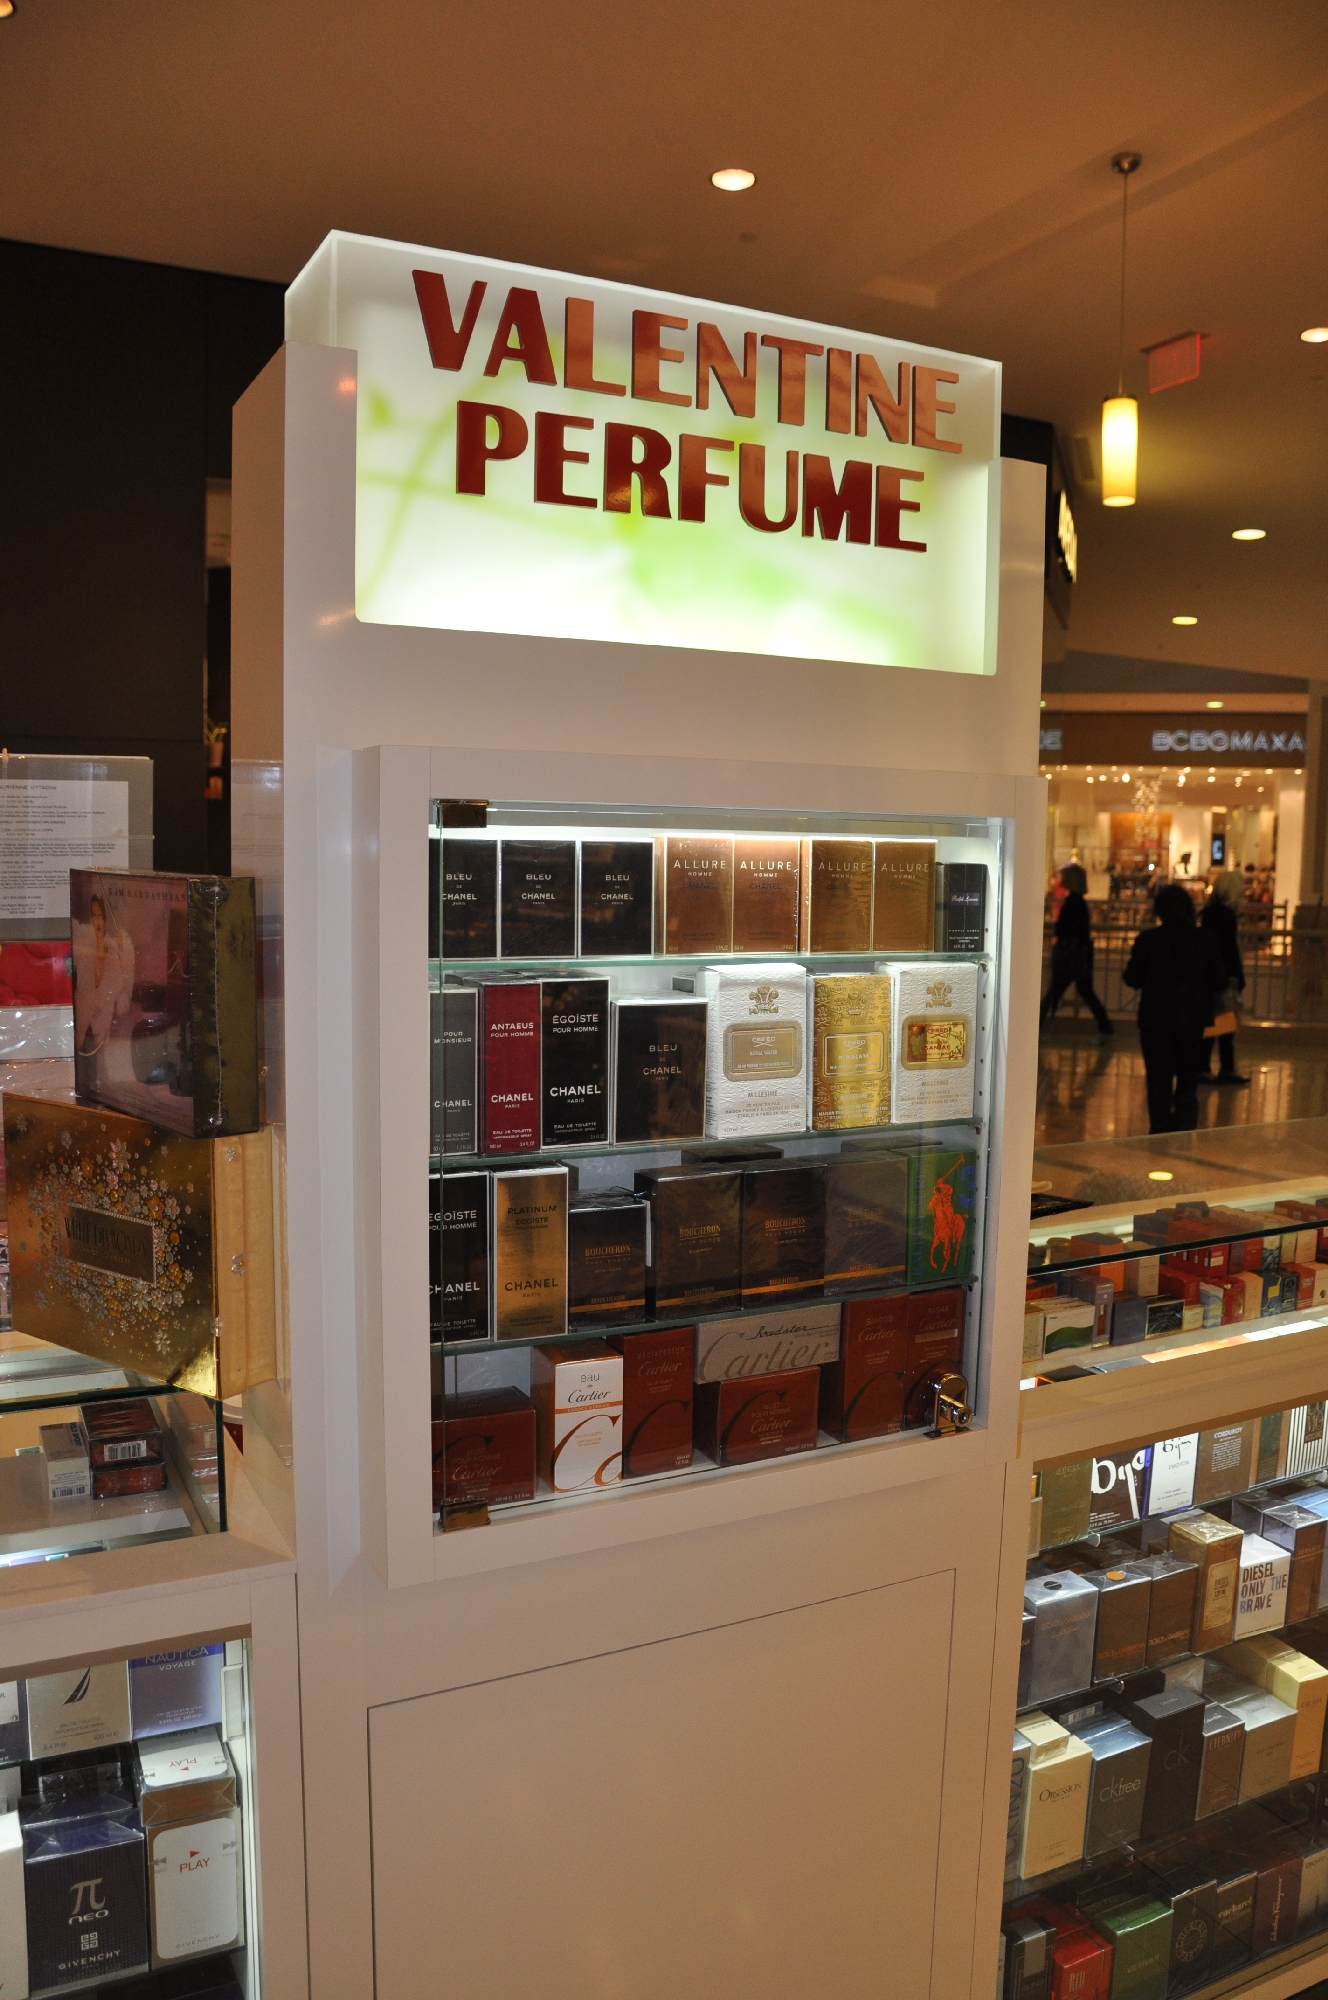 Valentine Perfume Kiosk BWC - Resize _11.jpg